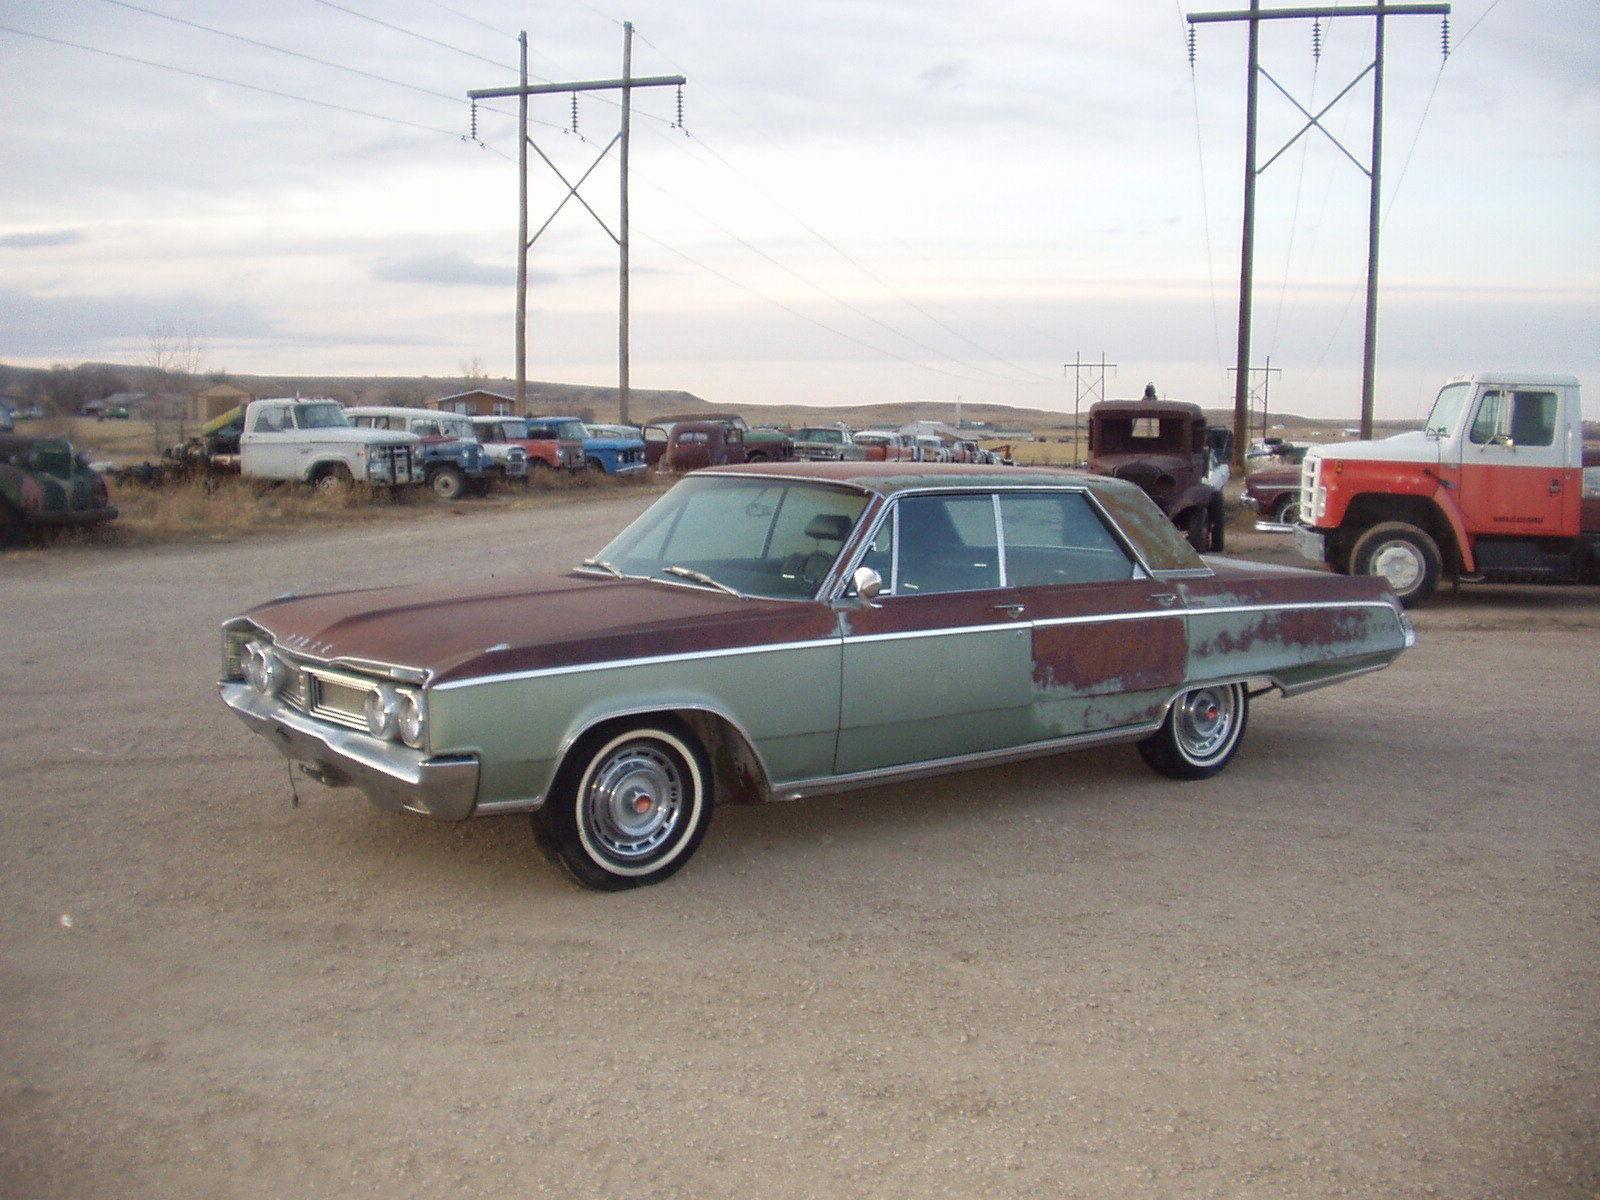 1967 Dodge Monaco Polara 4 Door Hardtop 440 Big Block Loaded